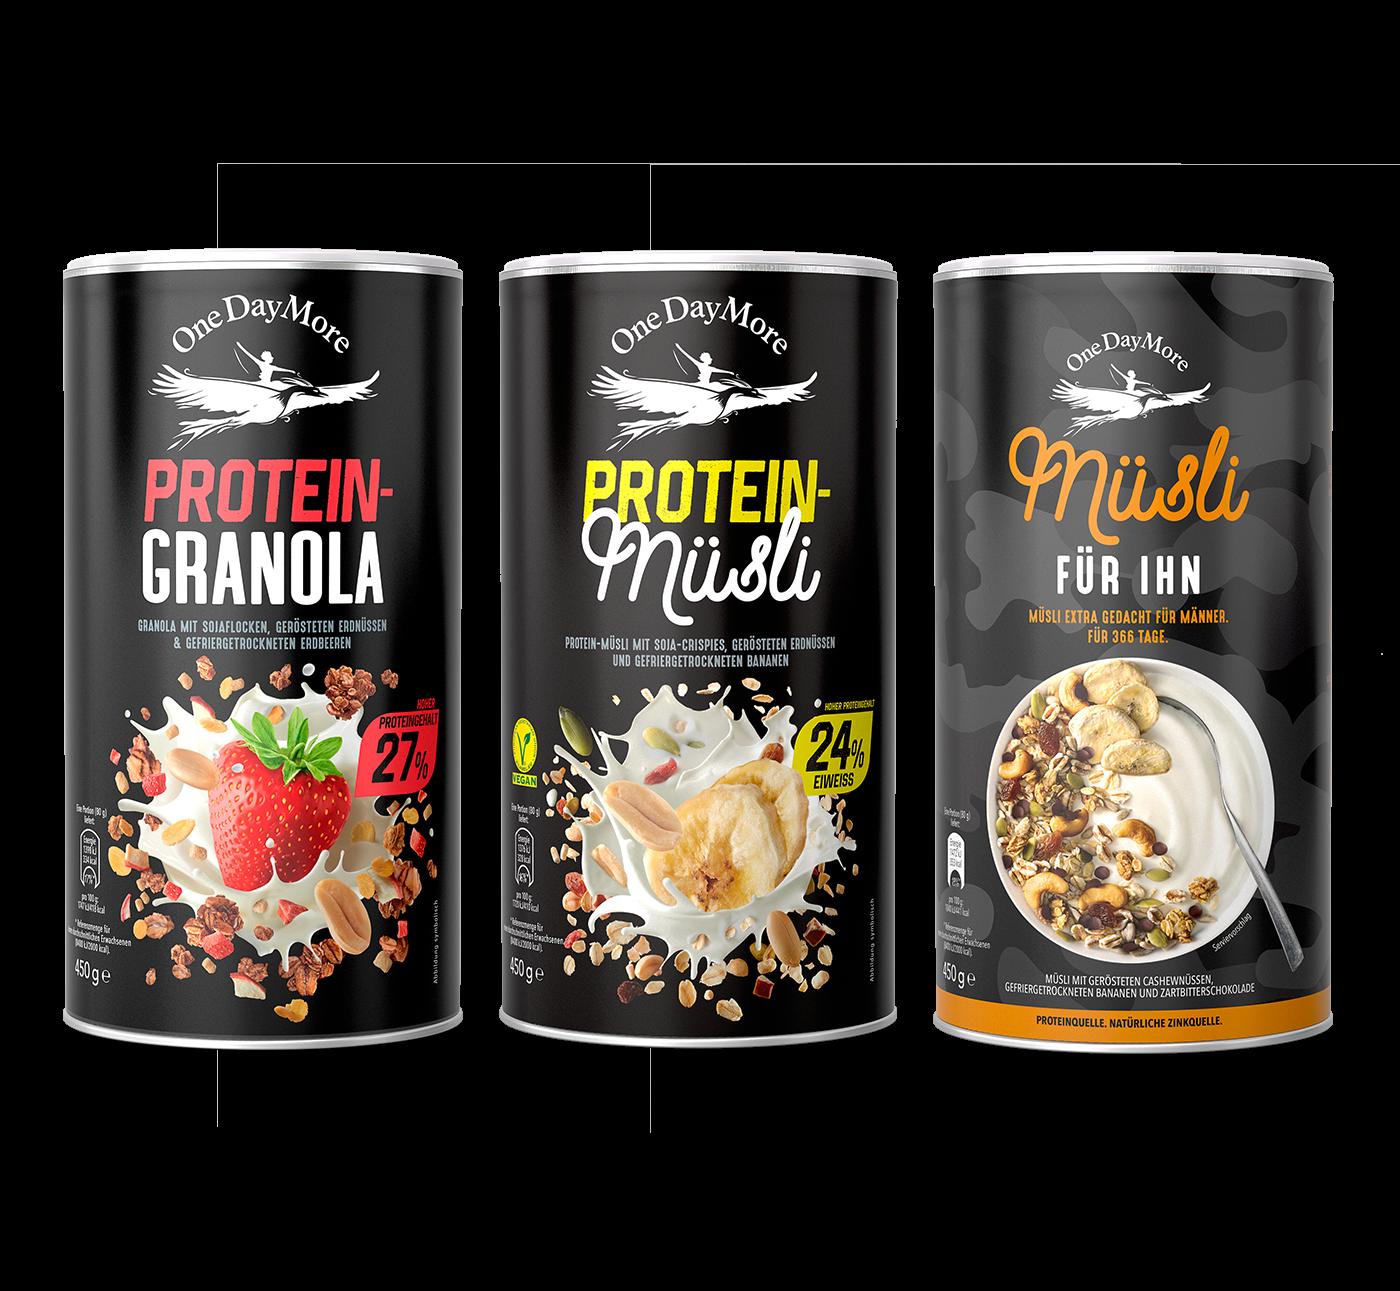 DE_Musli_i_granola_proteinowe_Musli_meskie_1400x1291_v1